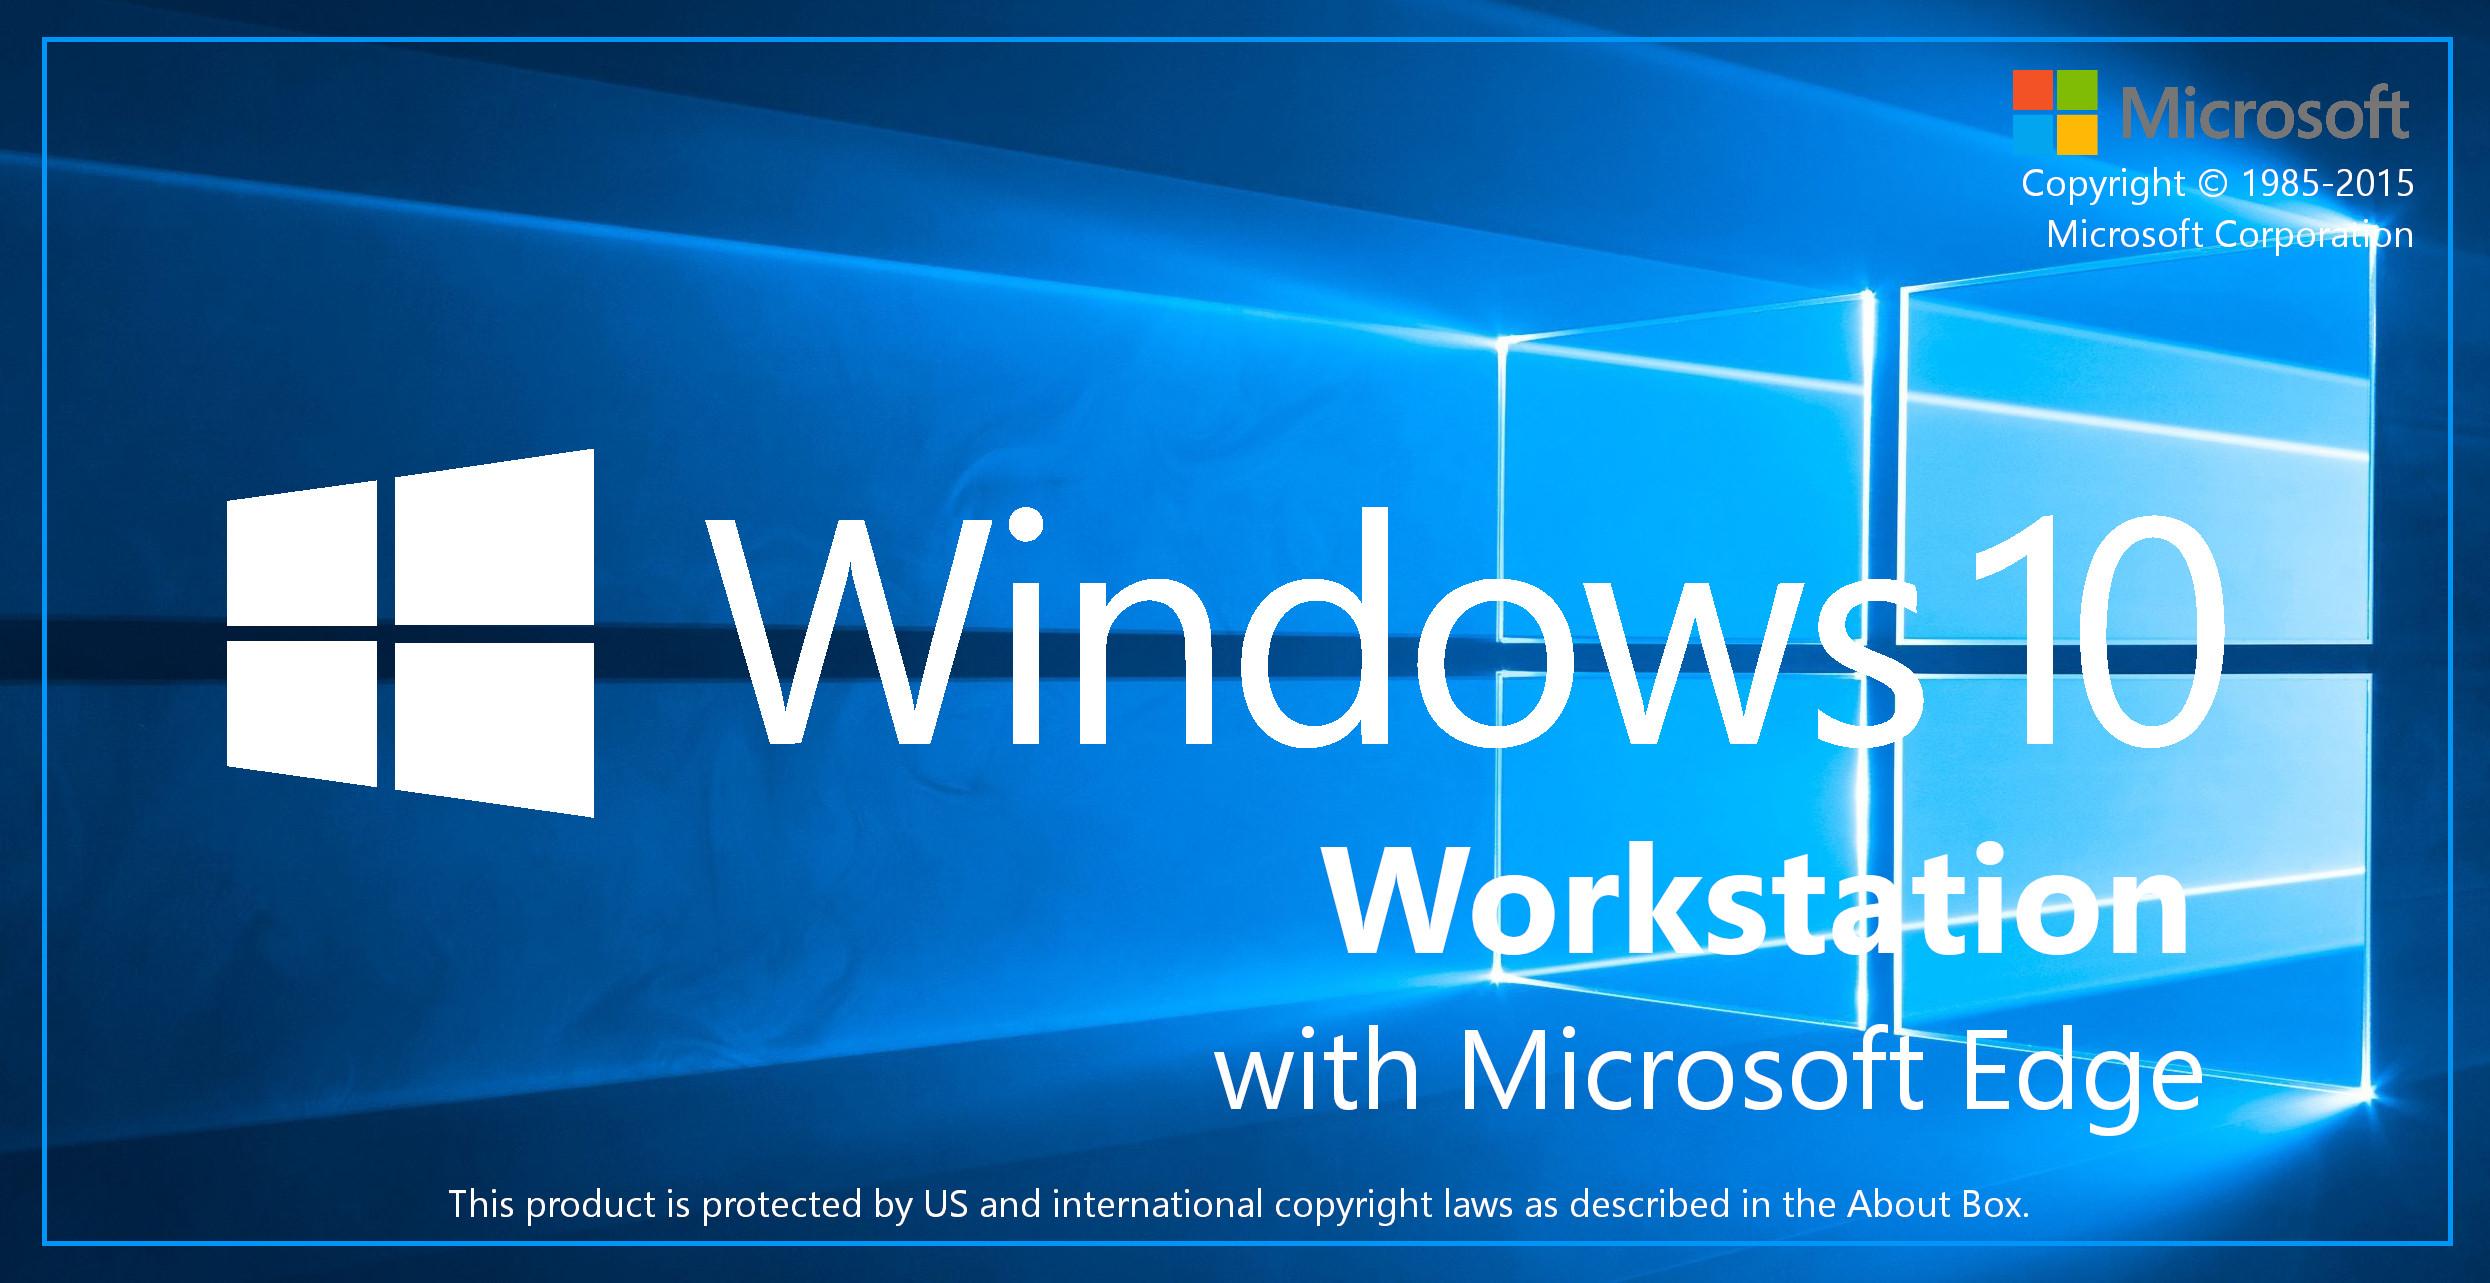 MetaI made this Windows NT 4.0 Workstation wallpaper remake of Windows 10  …